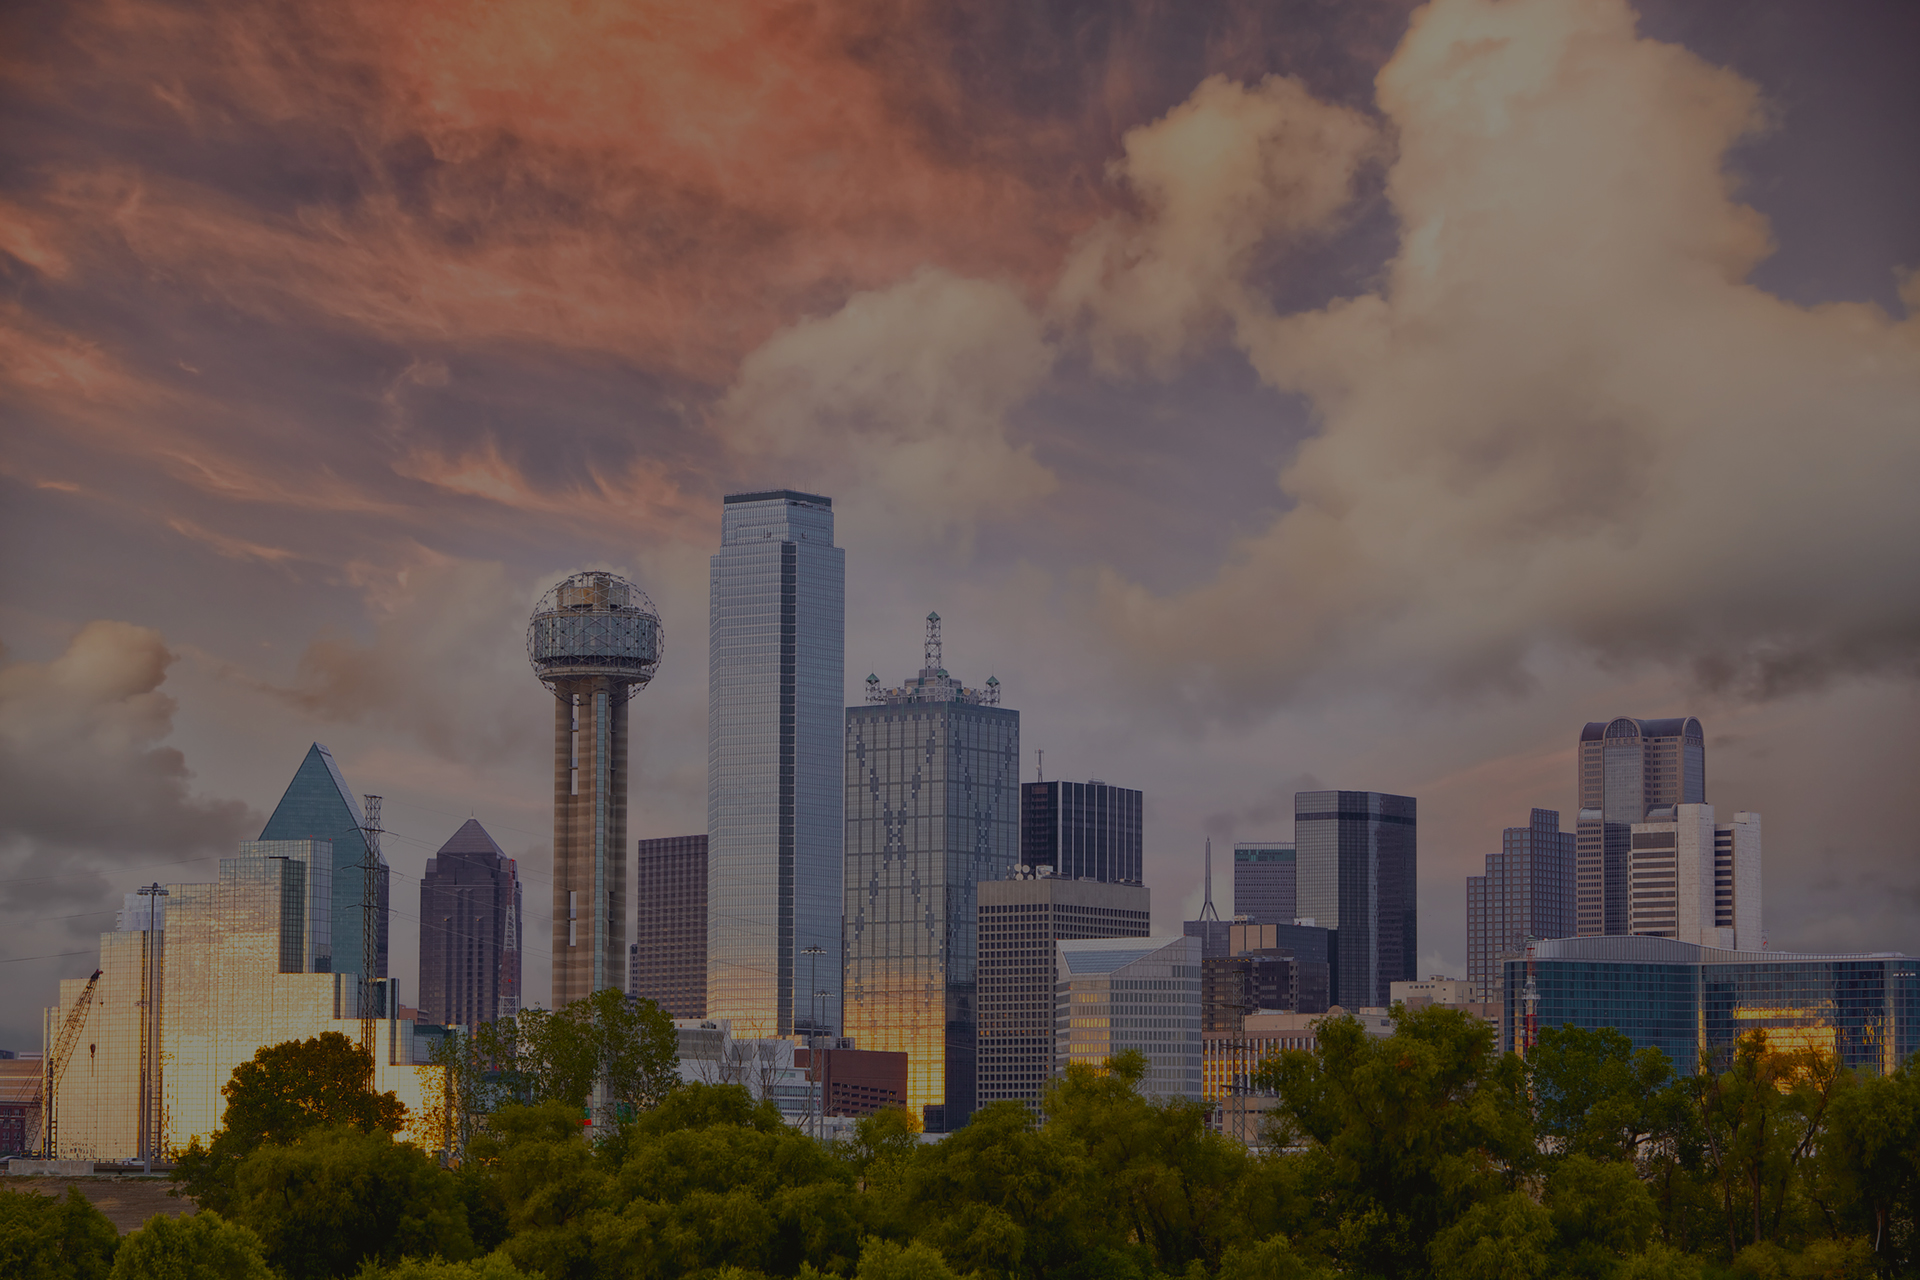 Dallas Texas Buildings & Skyline